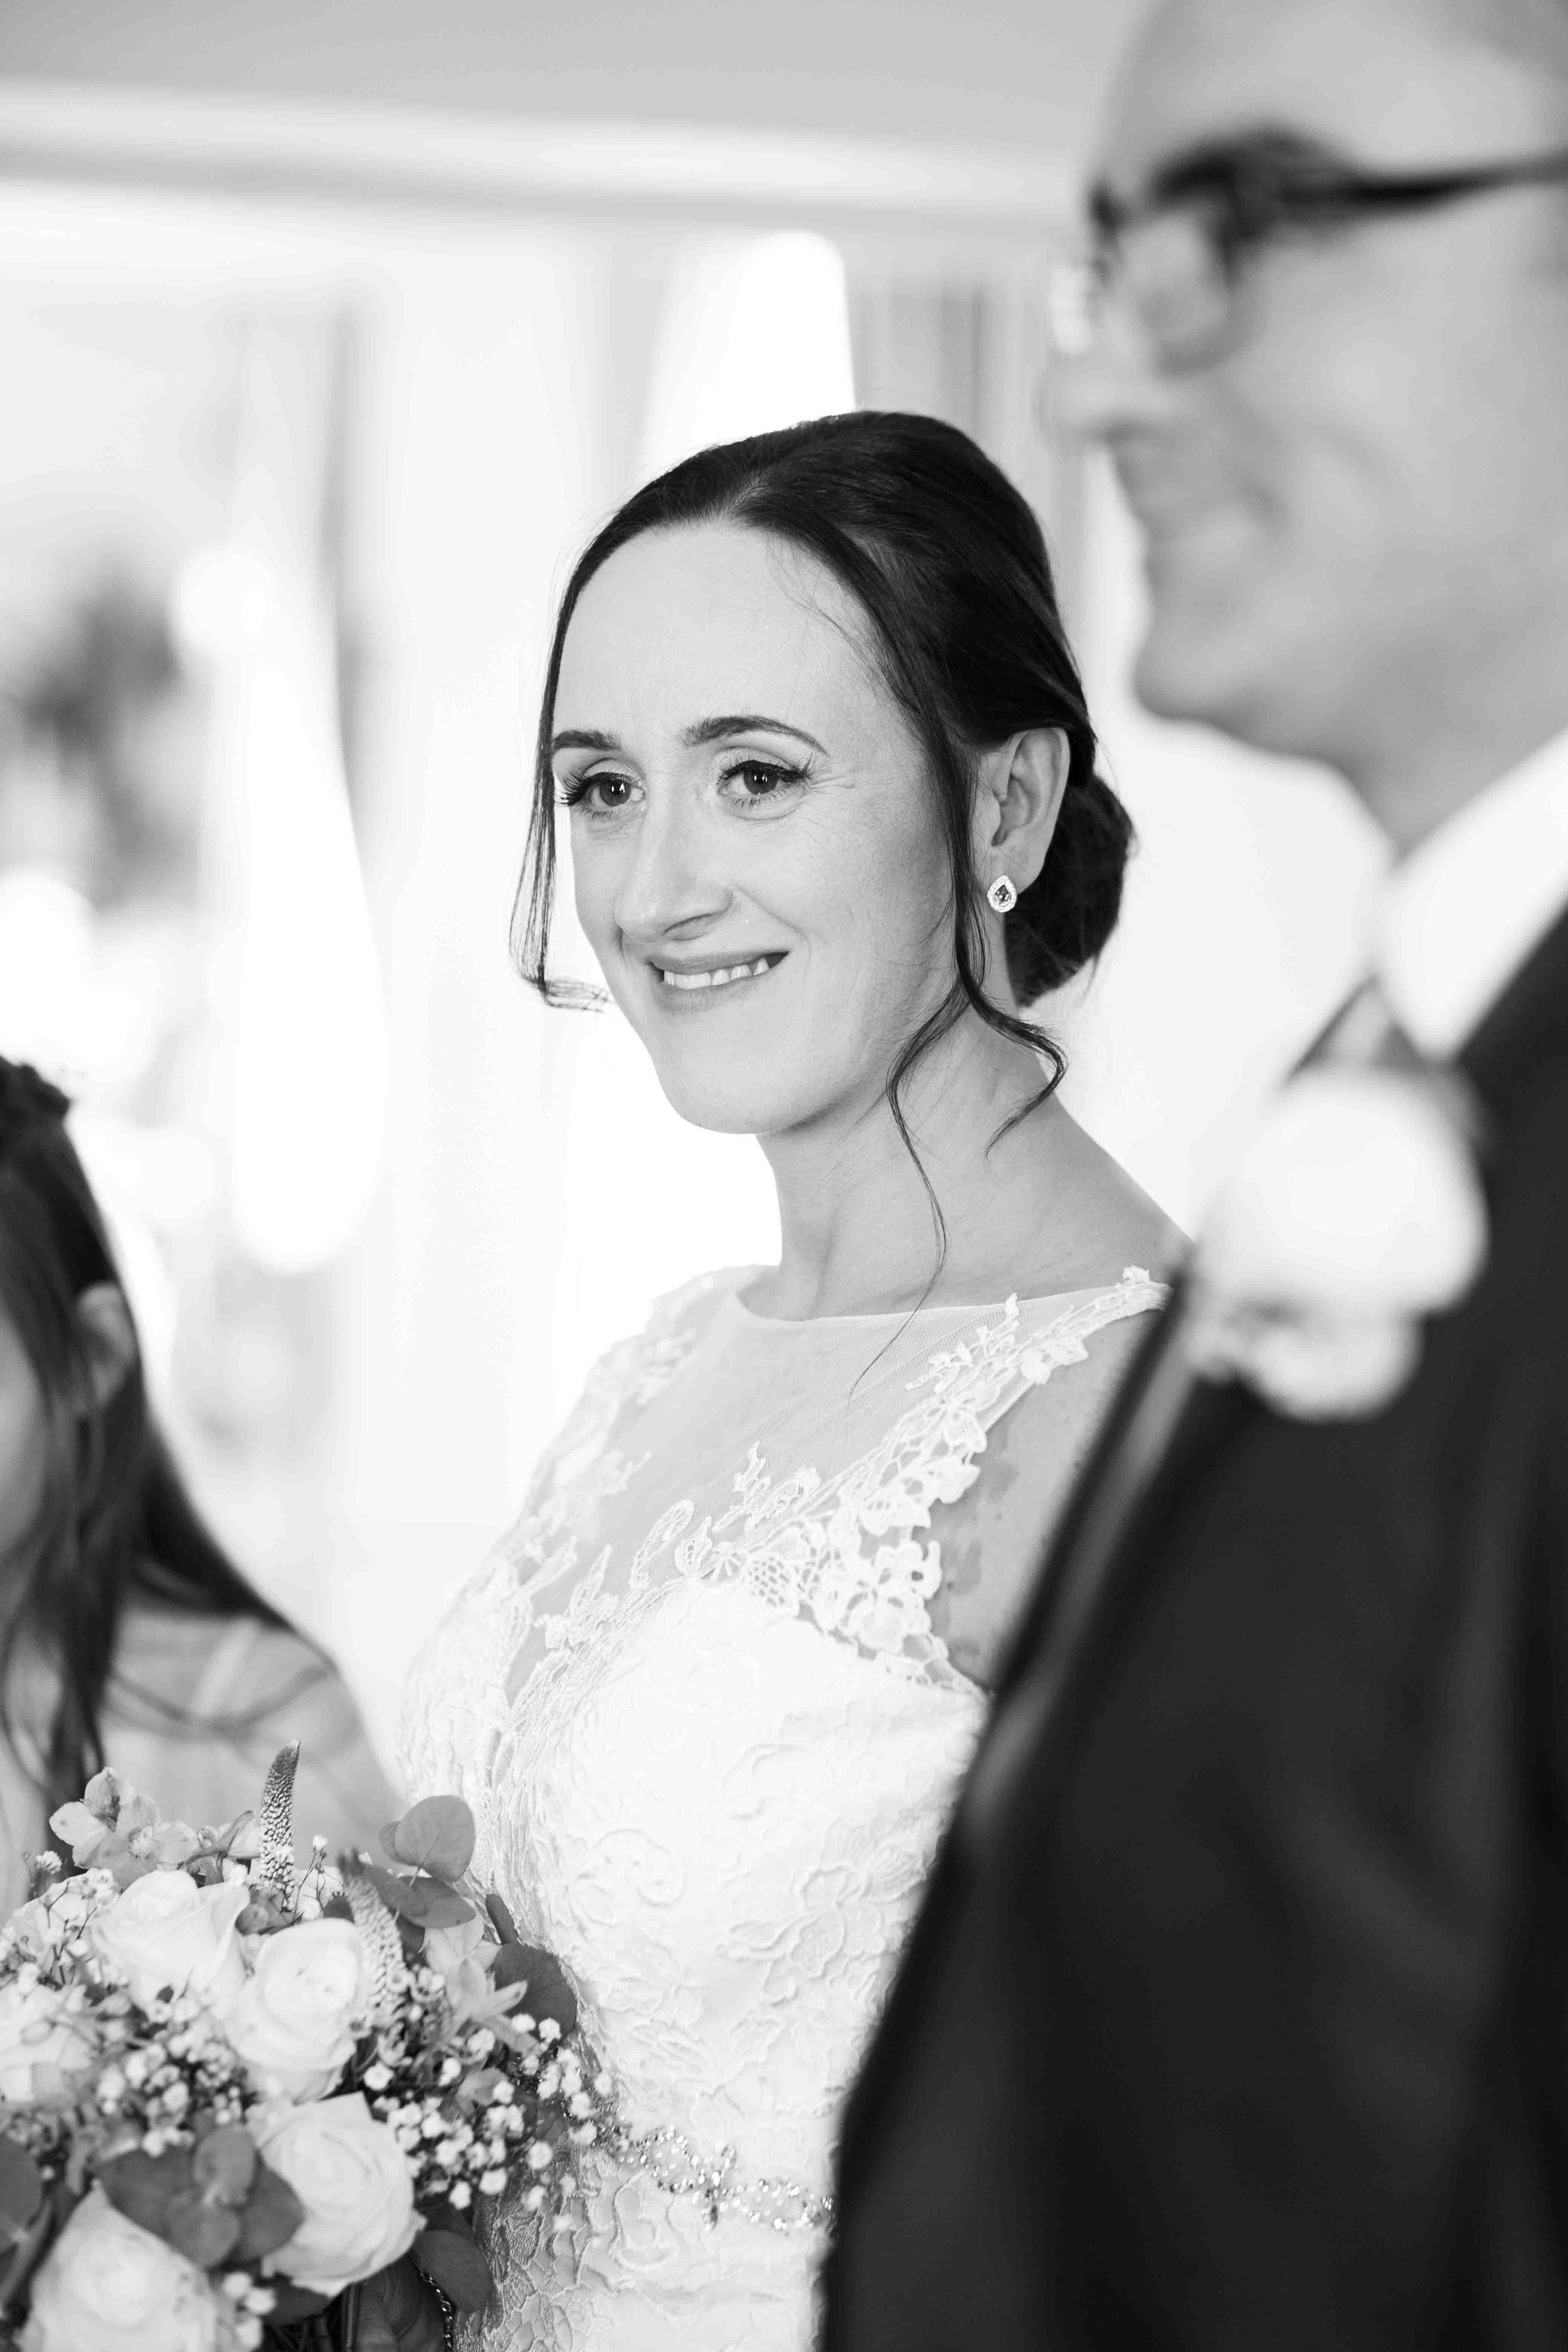 wedding-photos-willenhall-wedding-photographer-wolverhampton-wedding-photographer-west-midlands-wedding-photographer-birmingham-bride-vows-smile.jpg